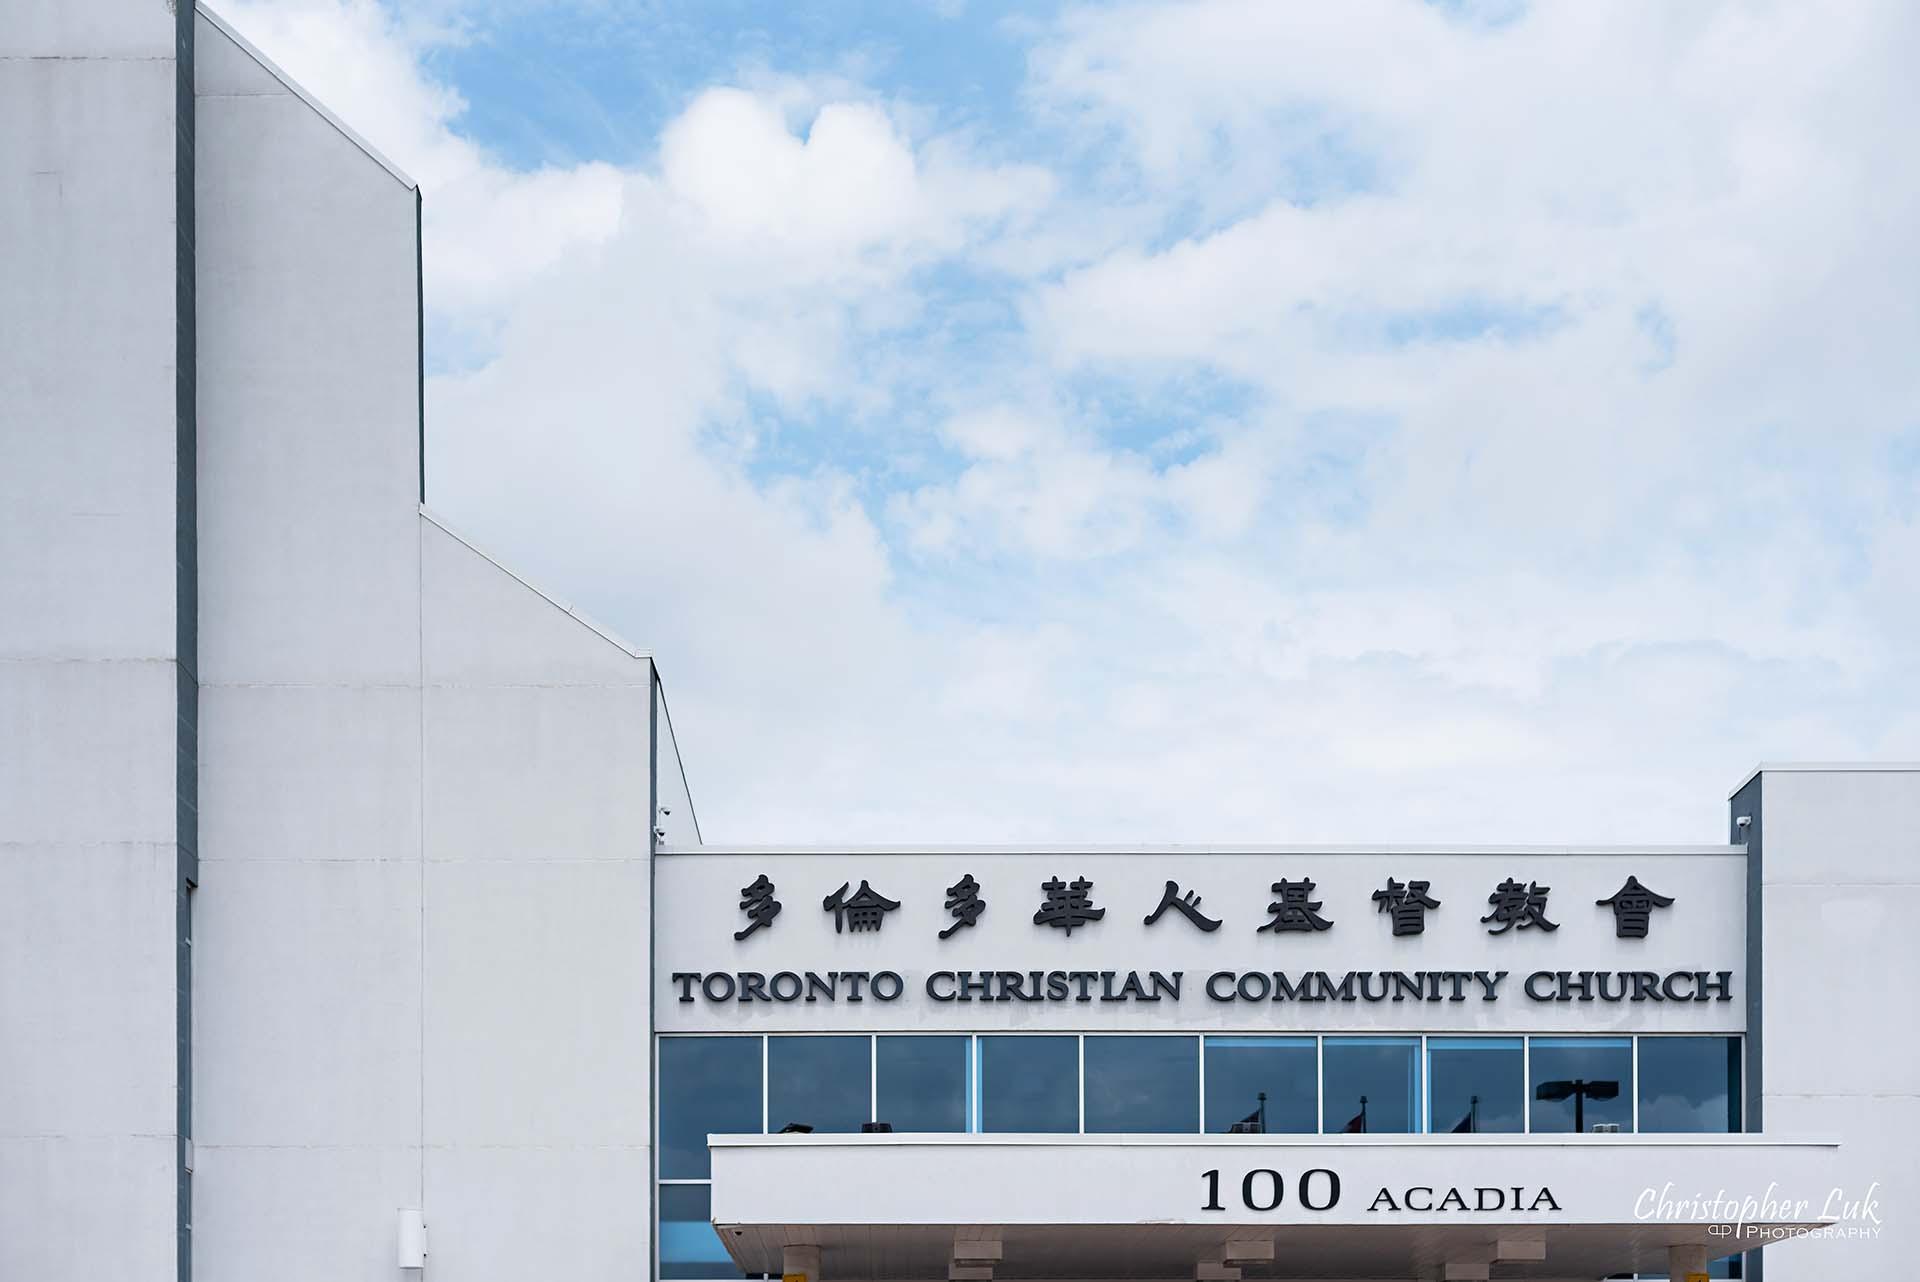 Christopher Luk Toronto Christian Community Church Kleinburg McMichael Art Gallery Presidente Banquet Hall Vaughan Wedding Photographer T3C TCCC Building Exterior Feature Cross Blue Sky Clouds Entrance Sign